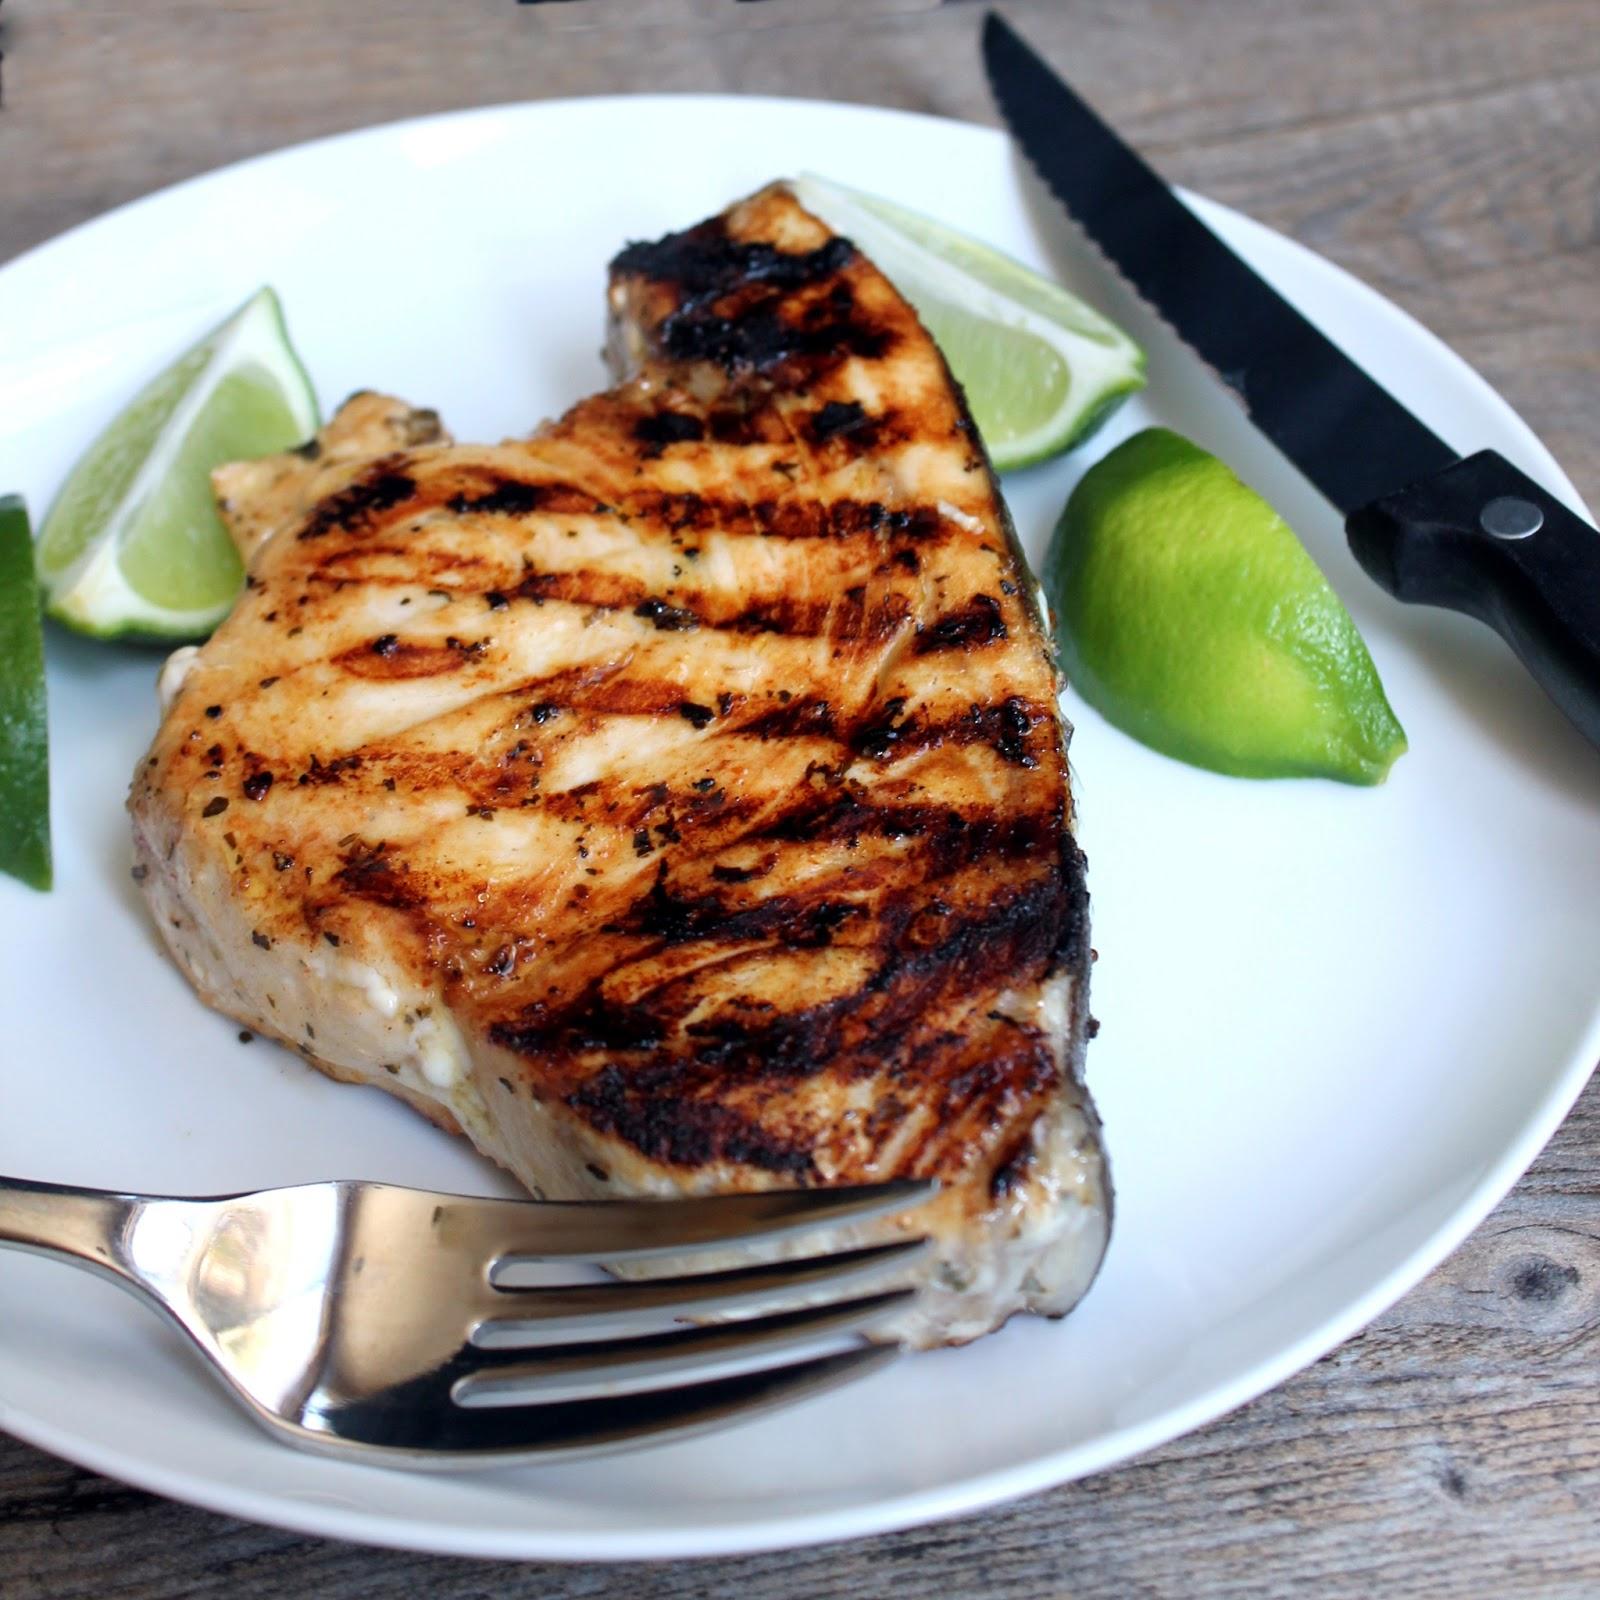 Grilled swordfish for Fish steak recipe